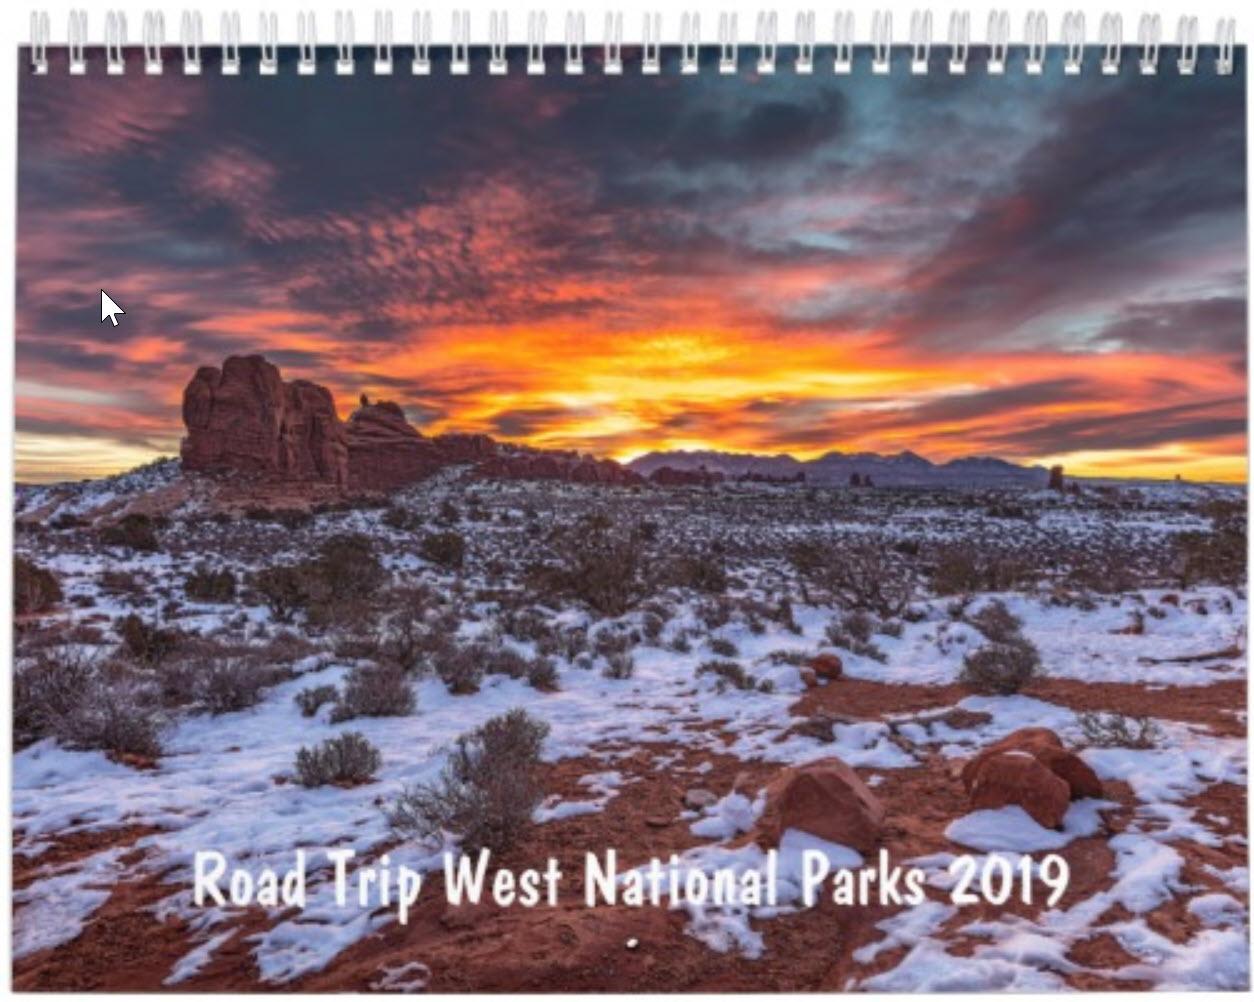 Road Trip West National Parks 2019